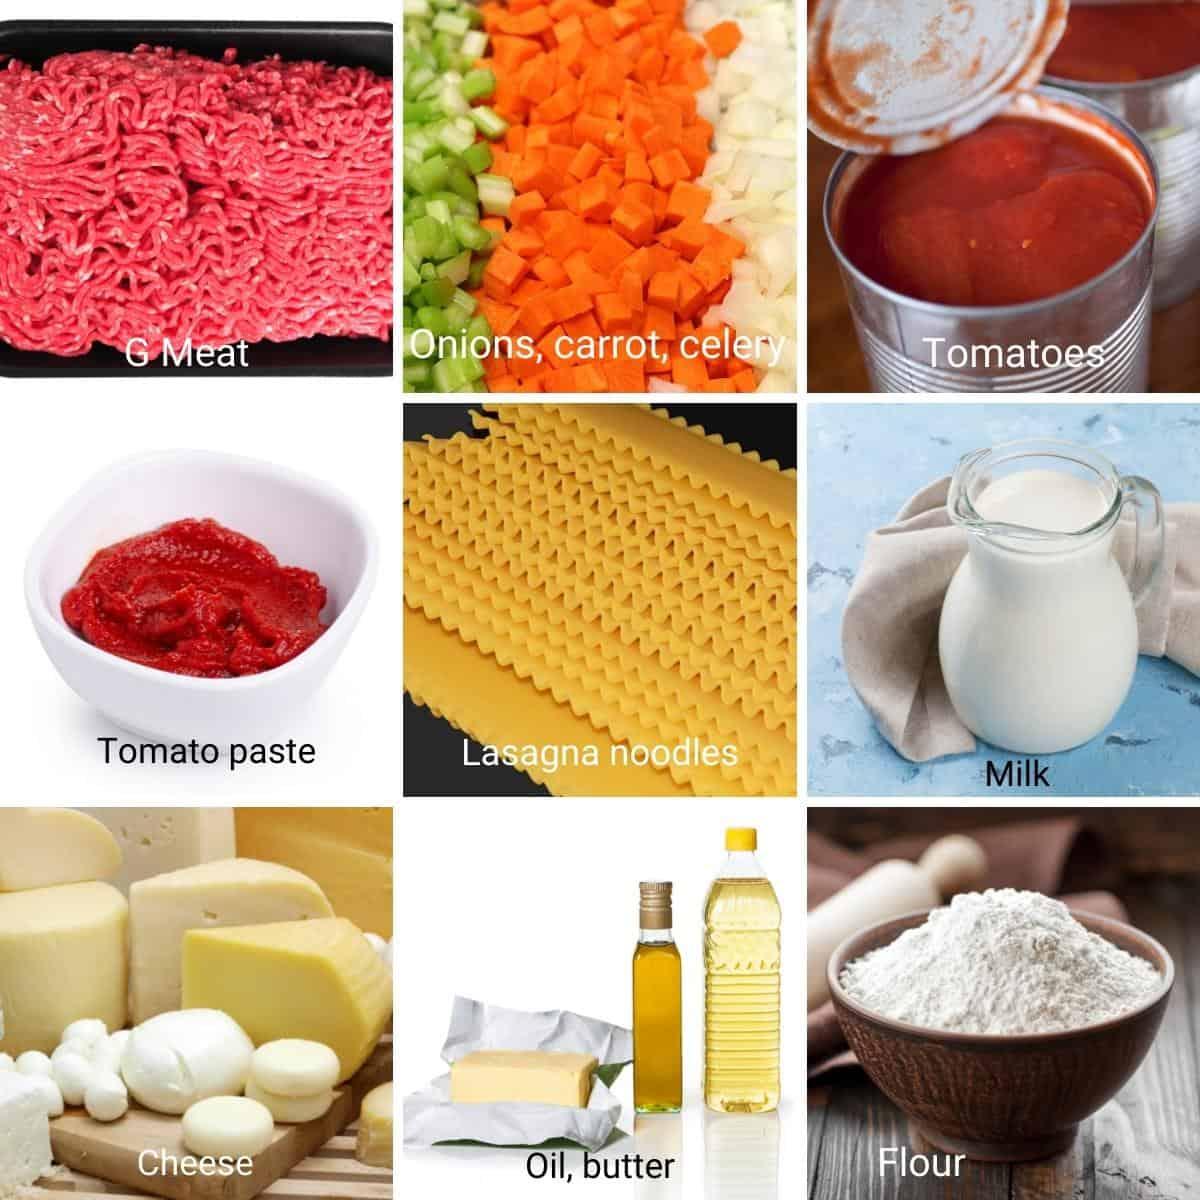 Ingredients for making lasagna with Bechamel sauce.